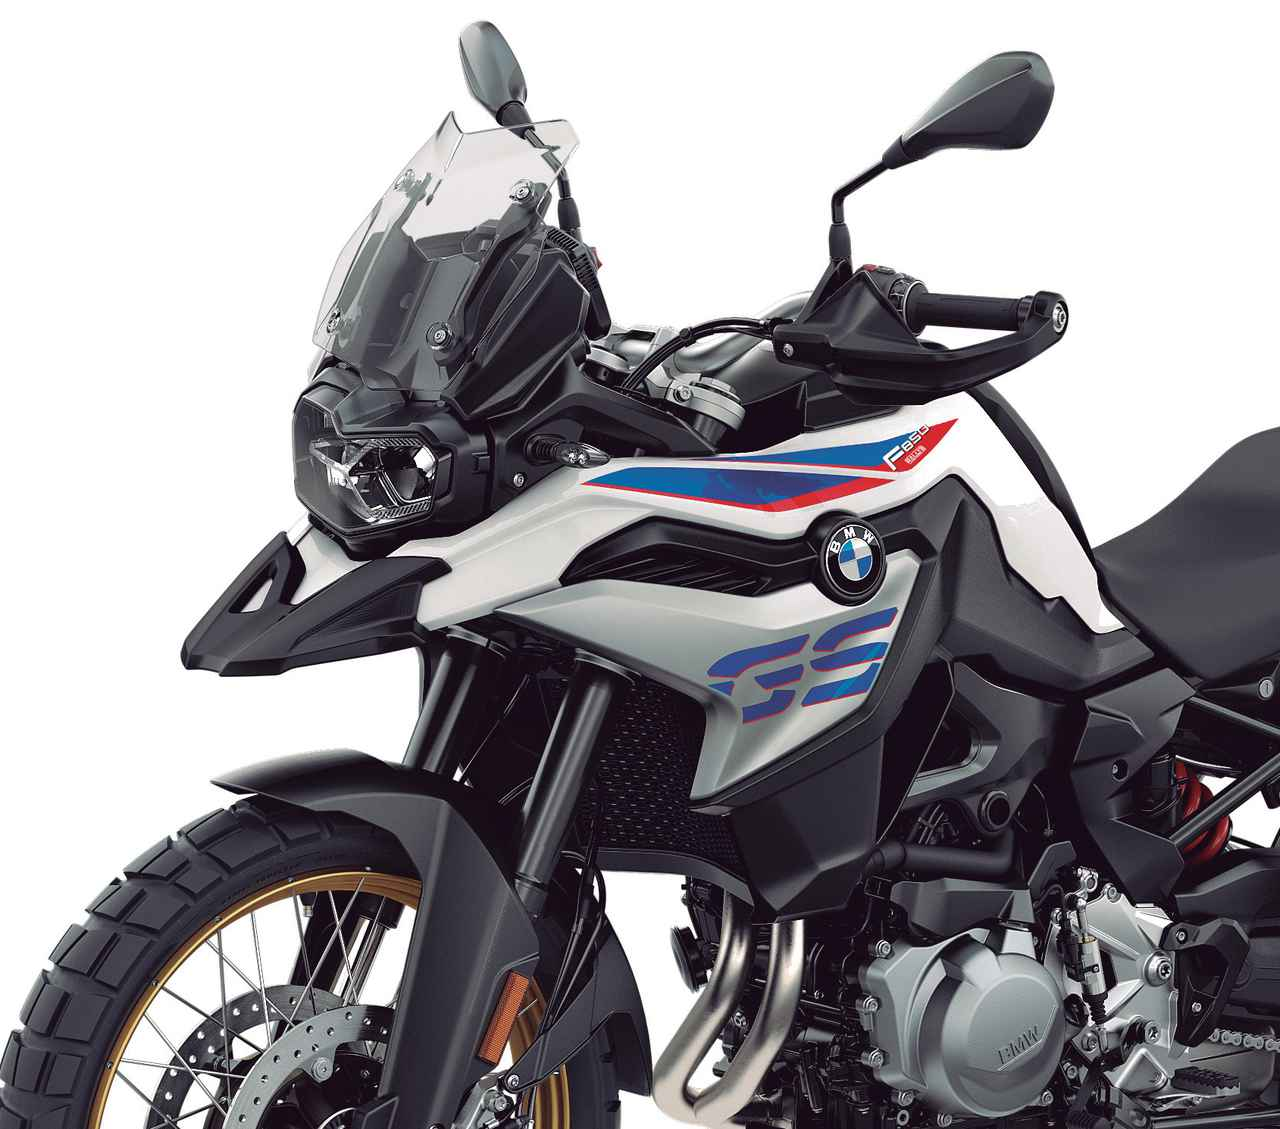 BMW「F850GS」【1分で読める!現行バイク特徴紹介2020】